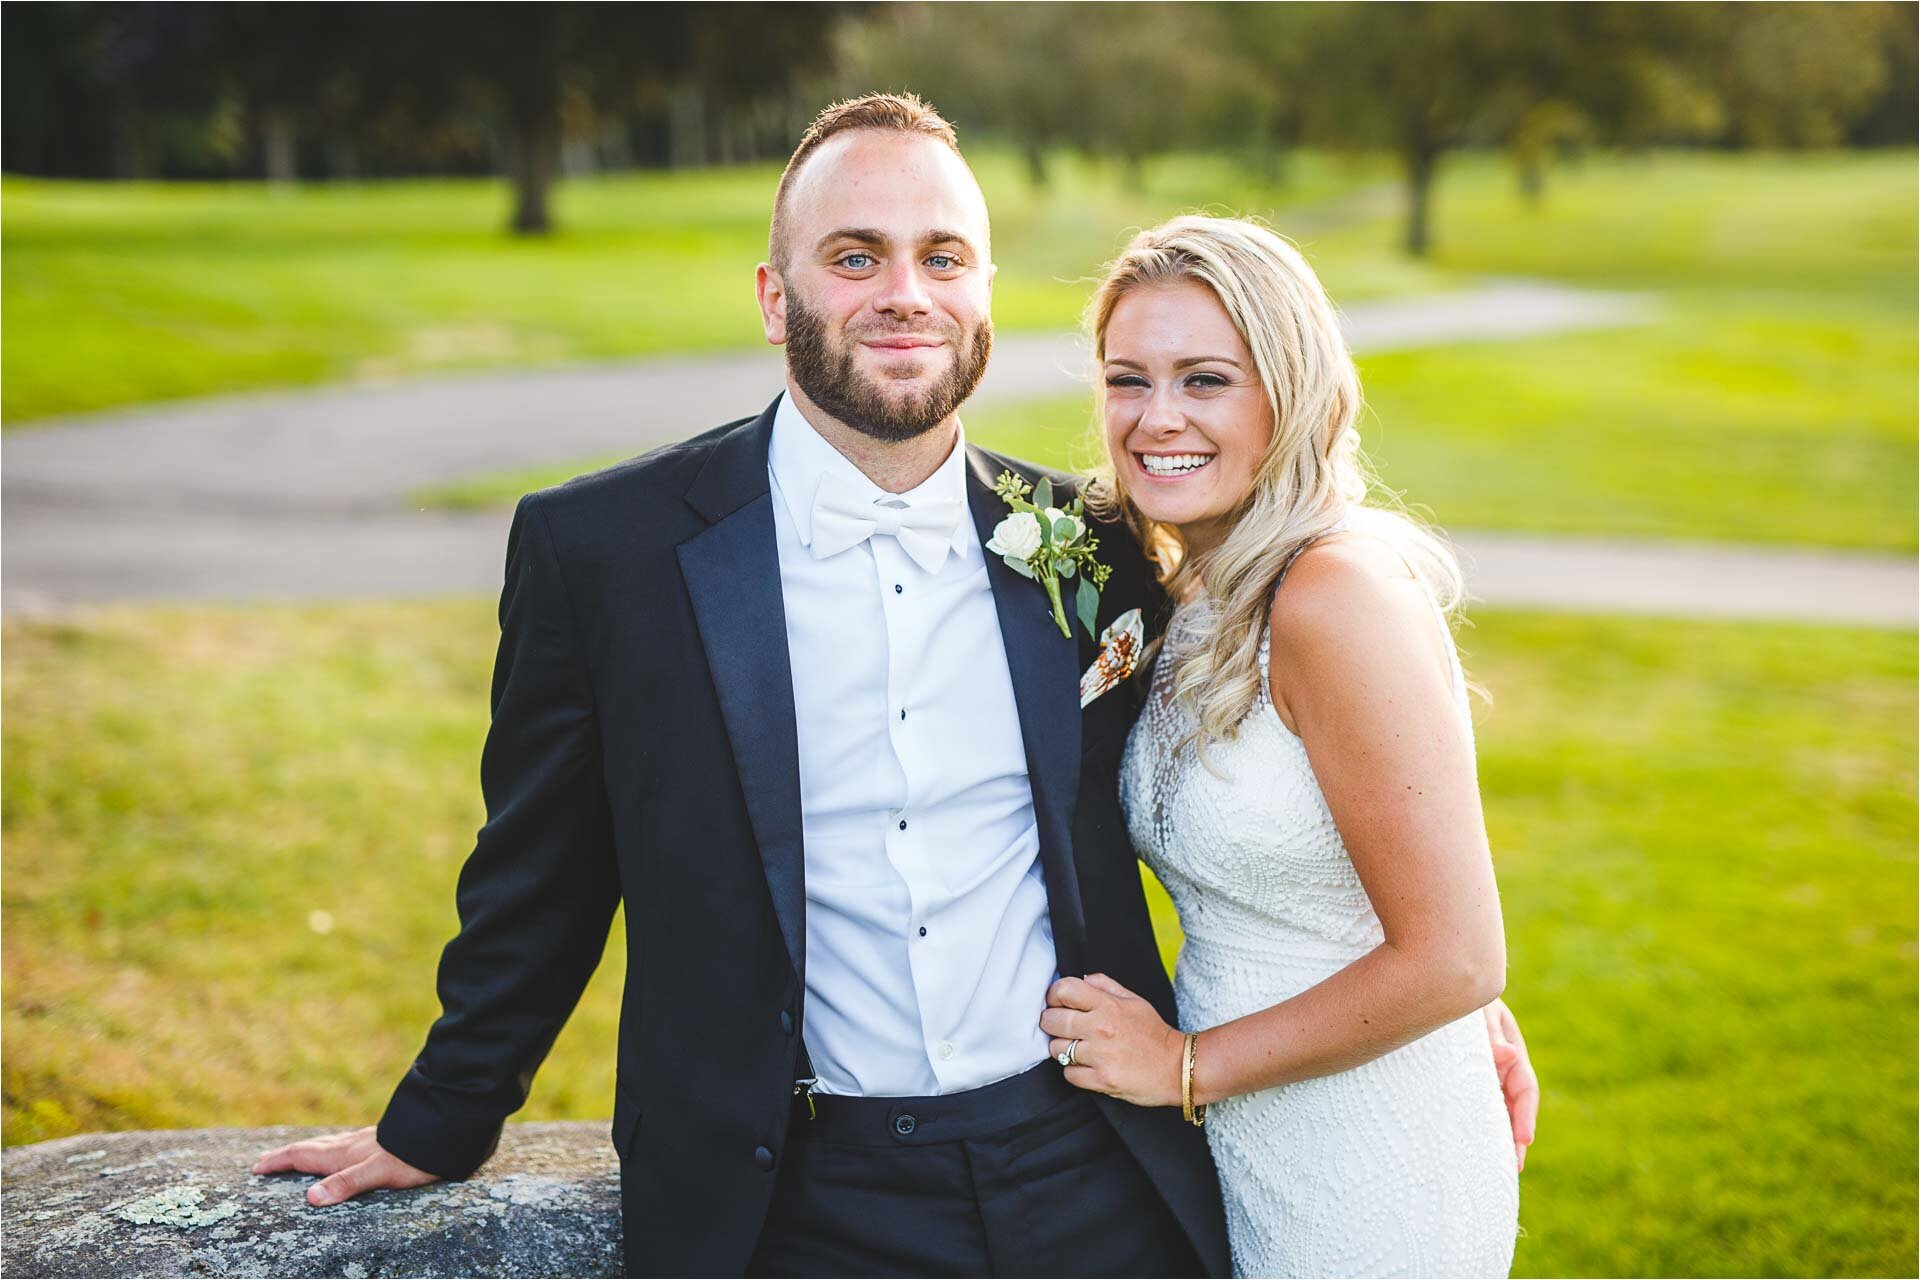 racebrook-countryclub-wedding-photography-22.jpg